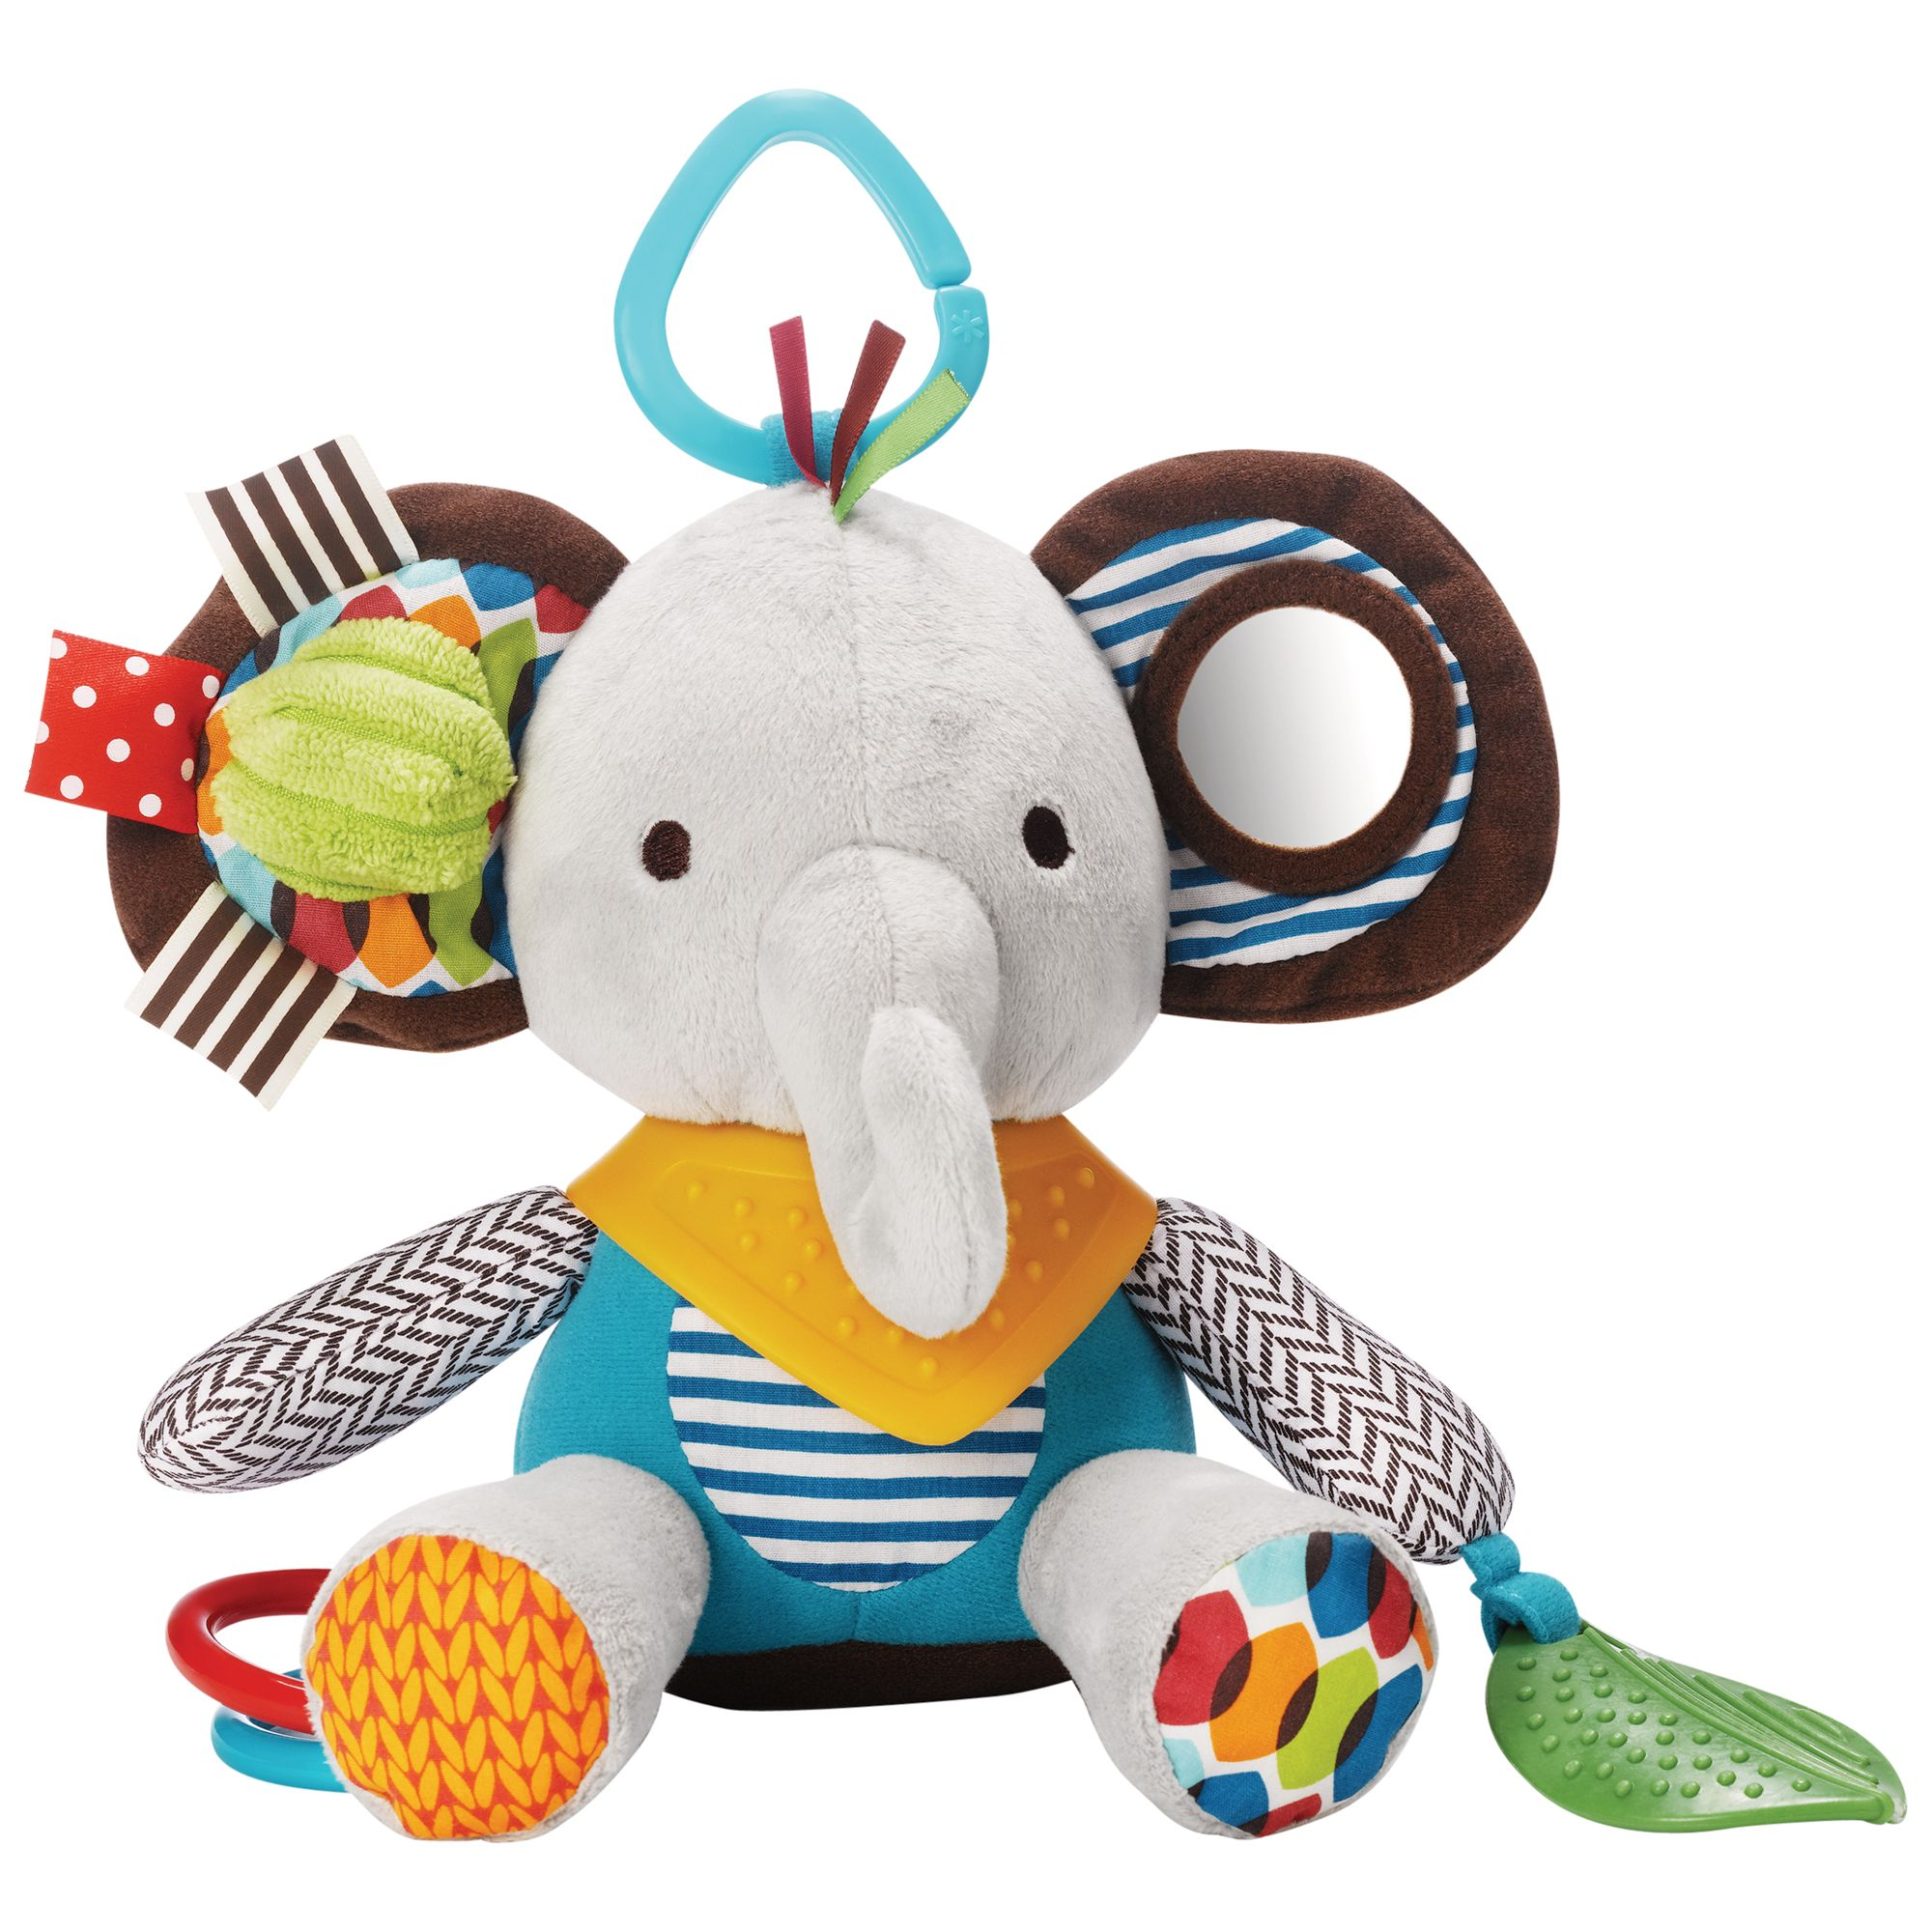 Skip Hop Skip Hop Bandana Buddies Elephant